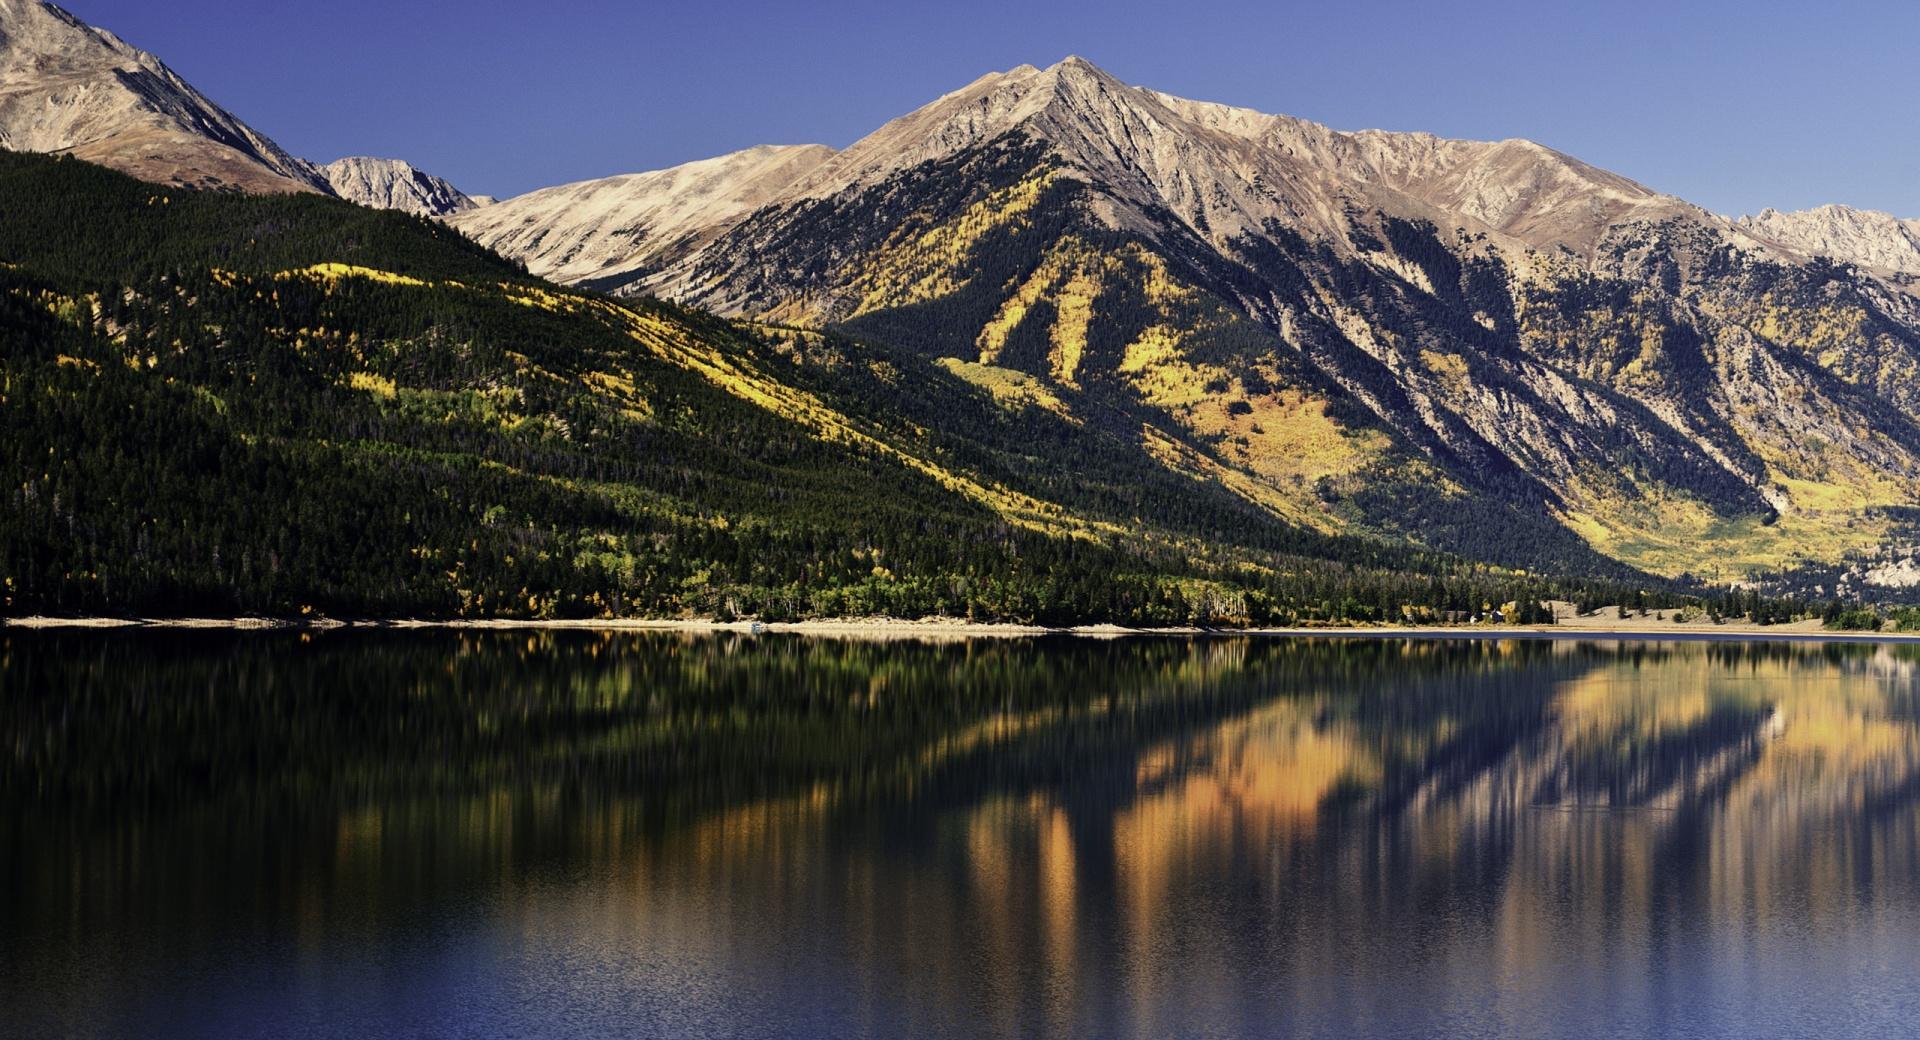 Big Mountain Lake wallpapers HD quality